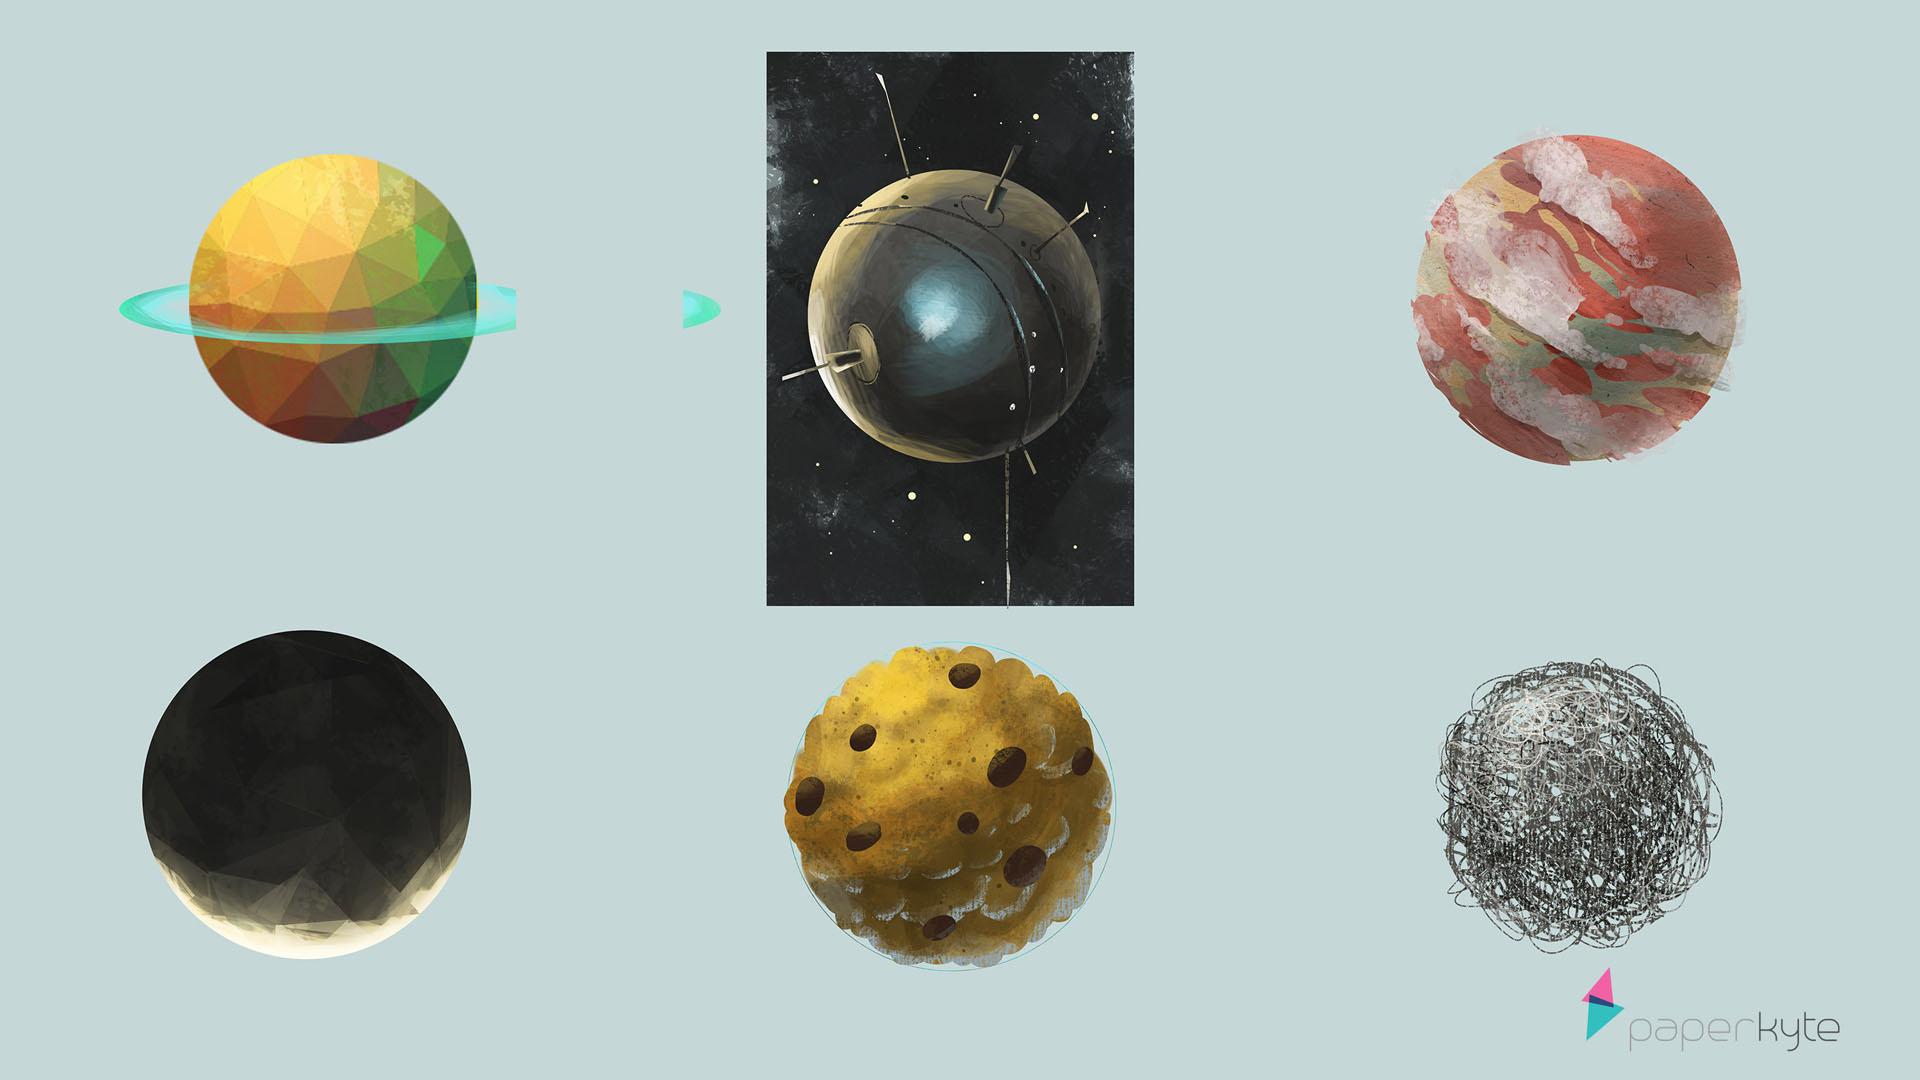 PlanetIdeas